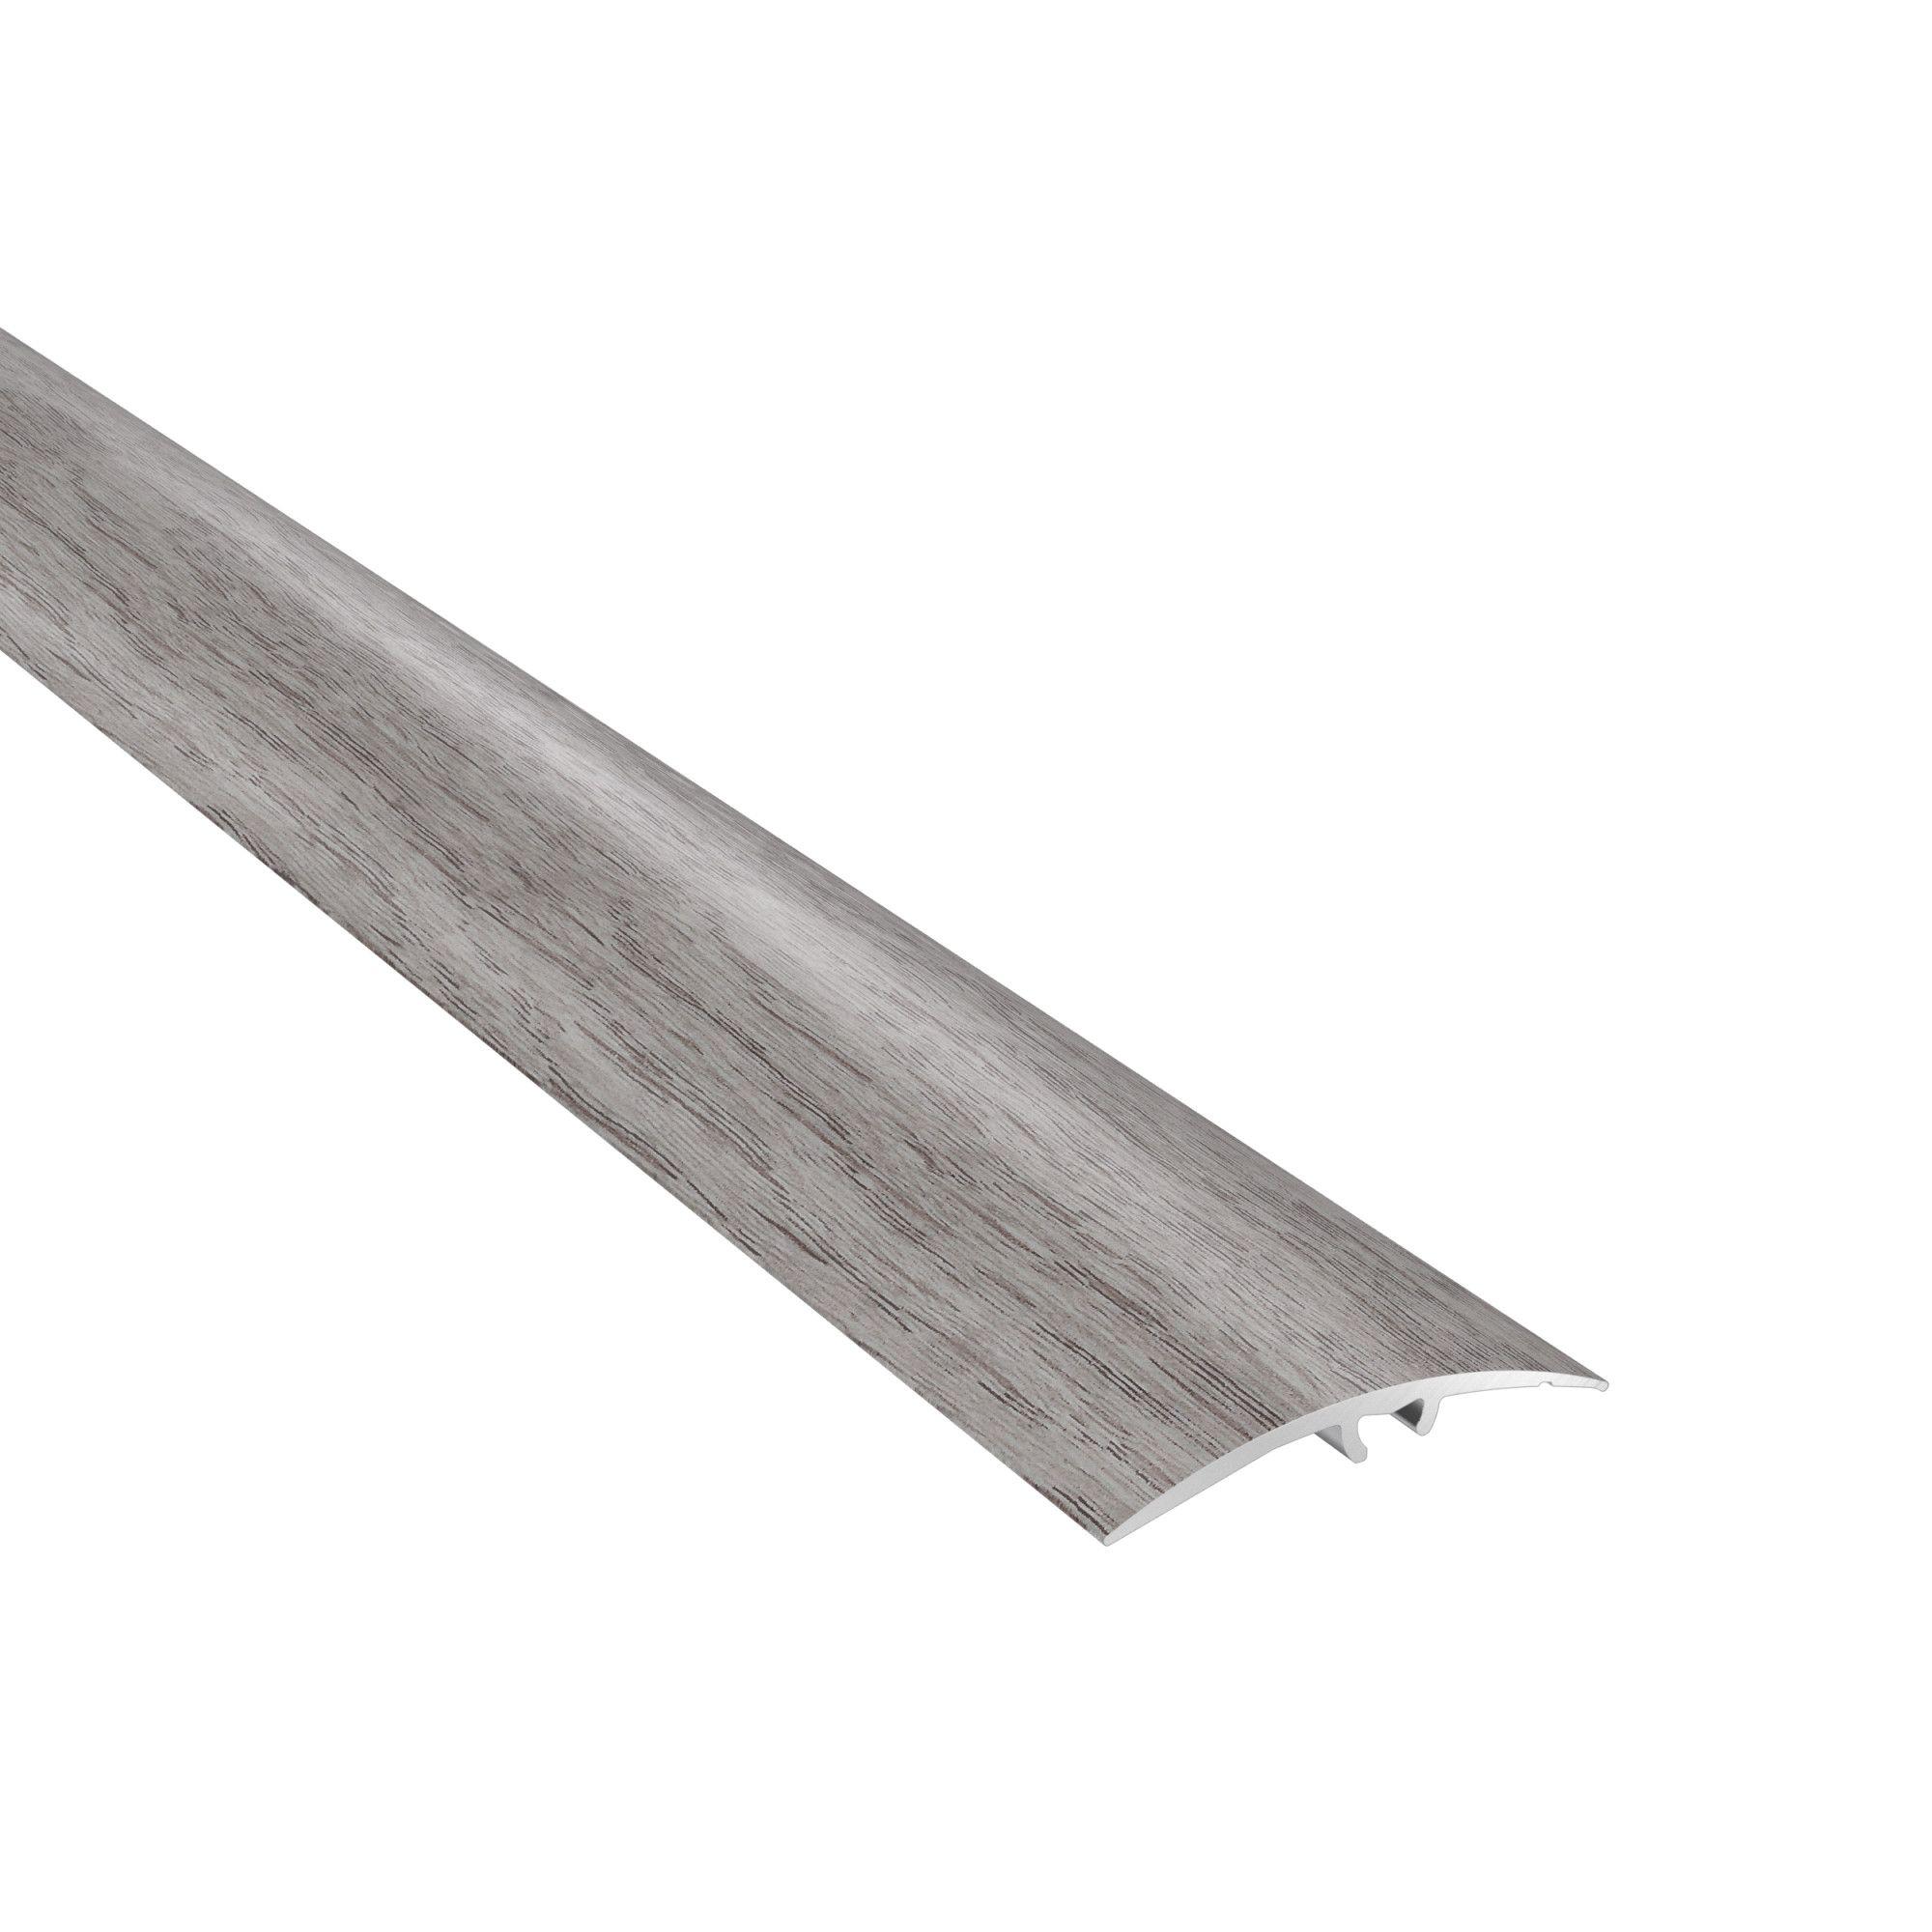 Profil de trecere cu surub mascat, diferenta de nivel SM2, Arbiton, stejar Boston, 0,93 m imagine 2021 mathaus